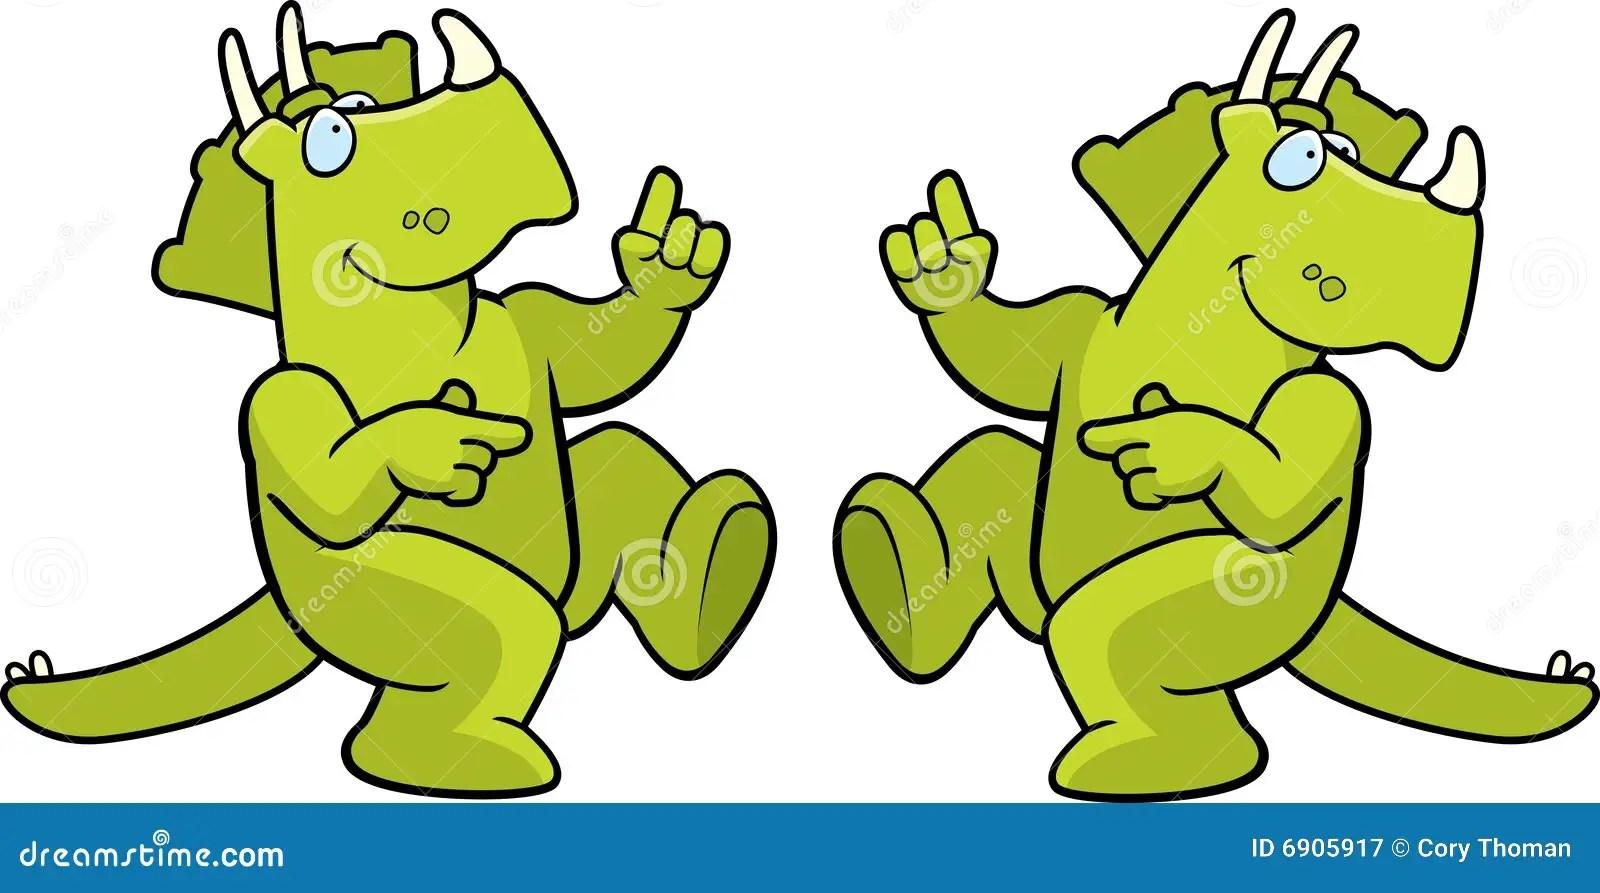 Cartoon Dancing Dog Animation